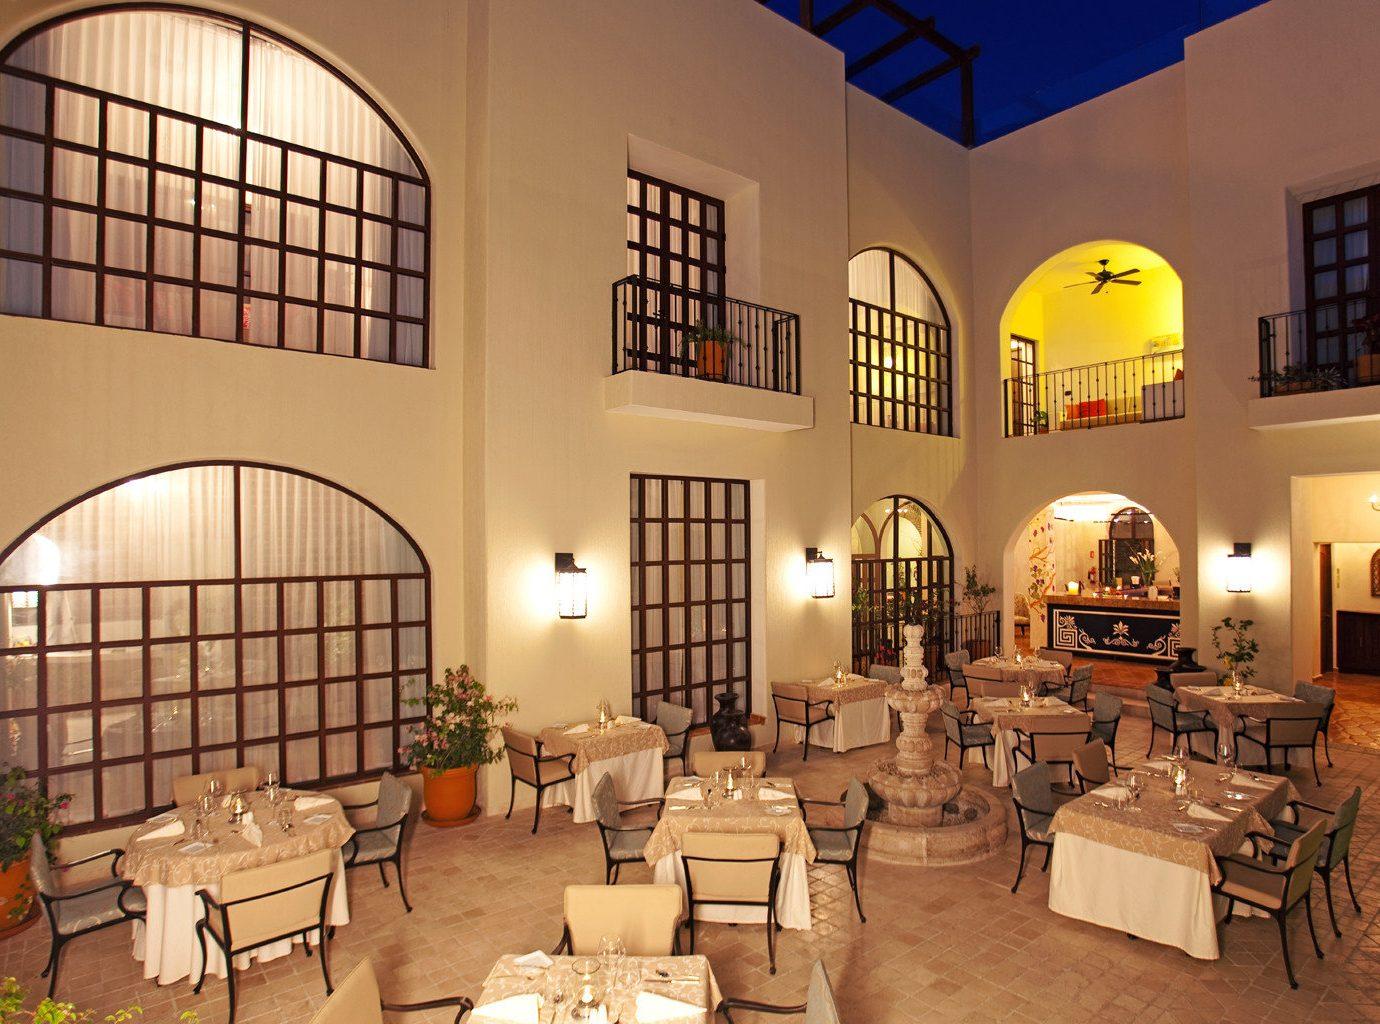 Dining Elegant Trip Ideas indoor floor property room Living Lobby estate interior design restaurant hacienda furniture living room